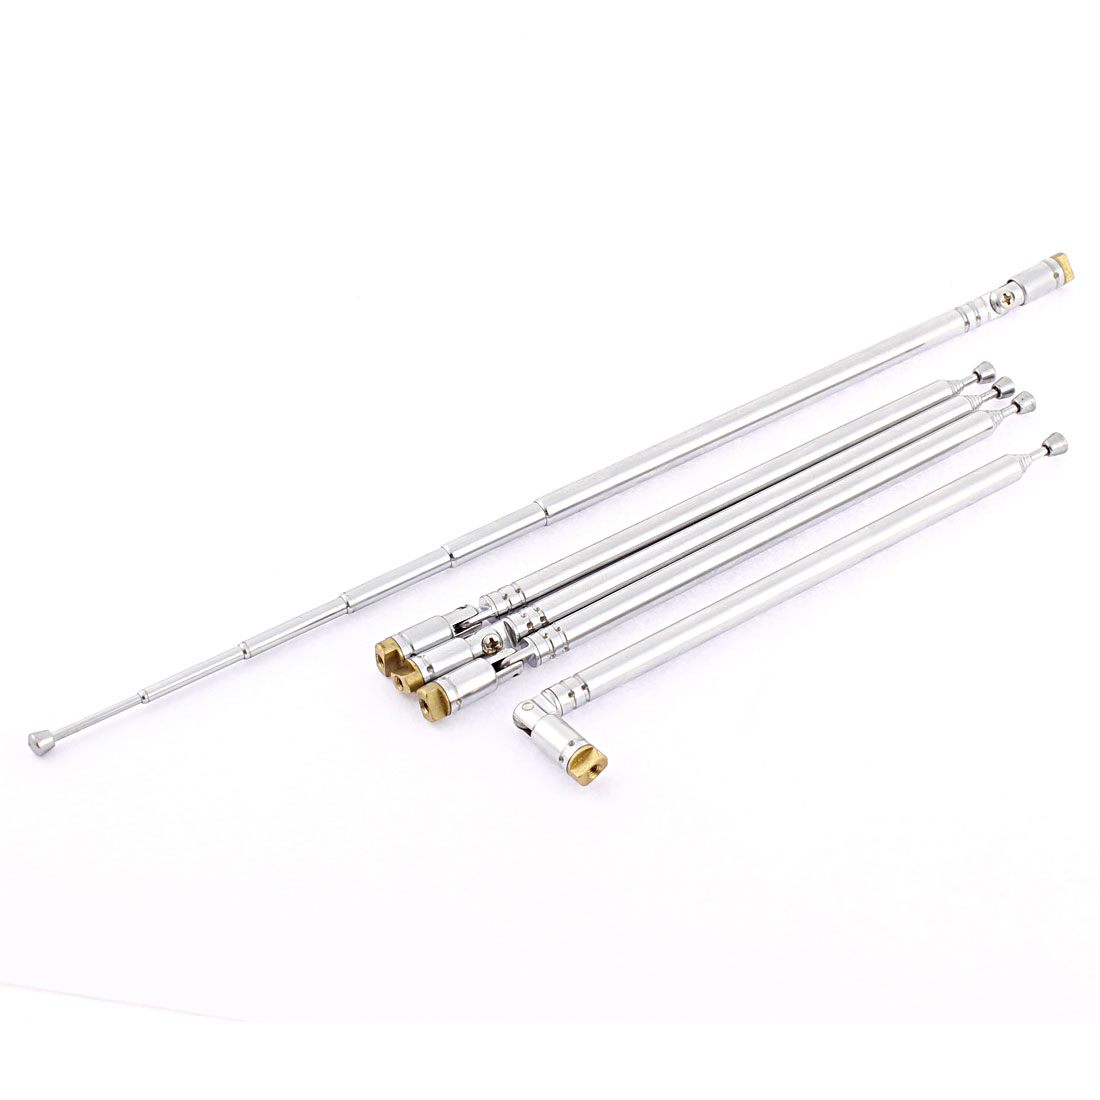 Rotatable 6 Sections Metal Car Radio Telescopic Antenna Silver Tone 5PCS